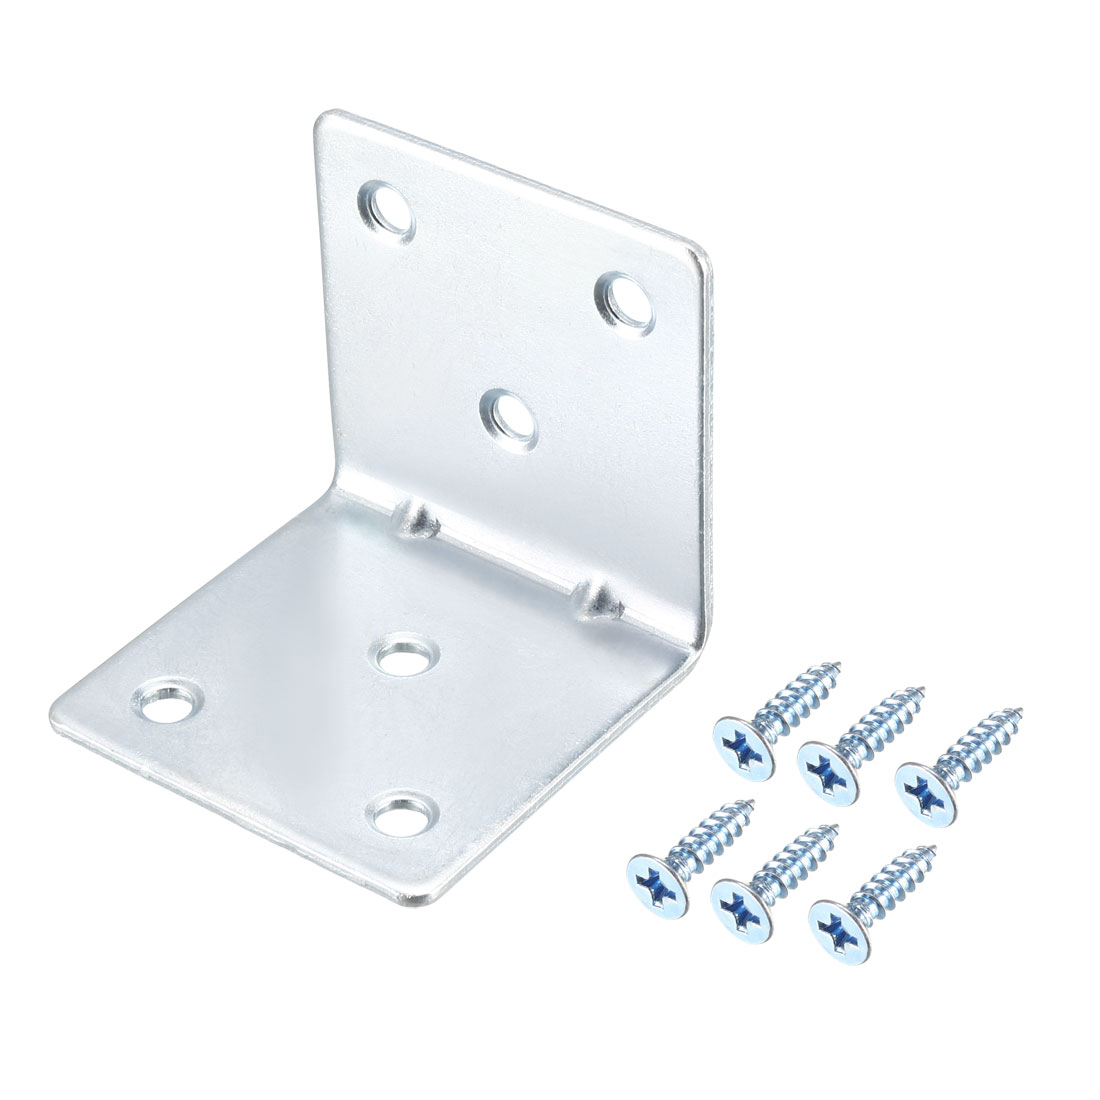 Corner Brace, 51x50x51mm Zinc Plated Joint Right Angle Bracket w Screws, 15 Pcs